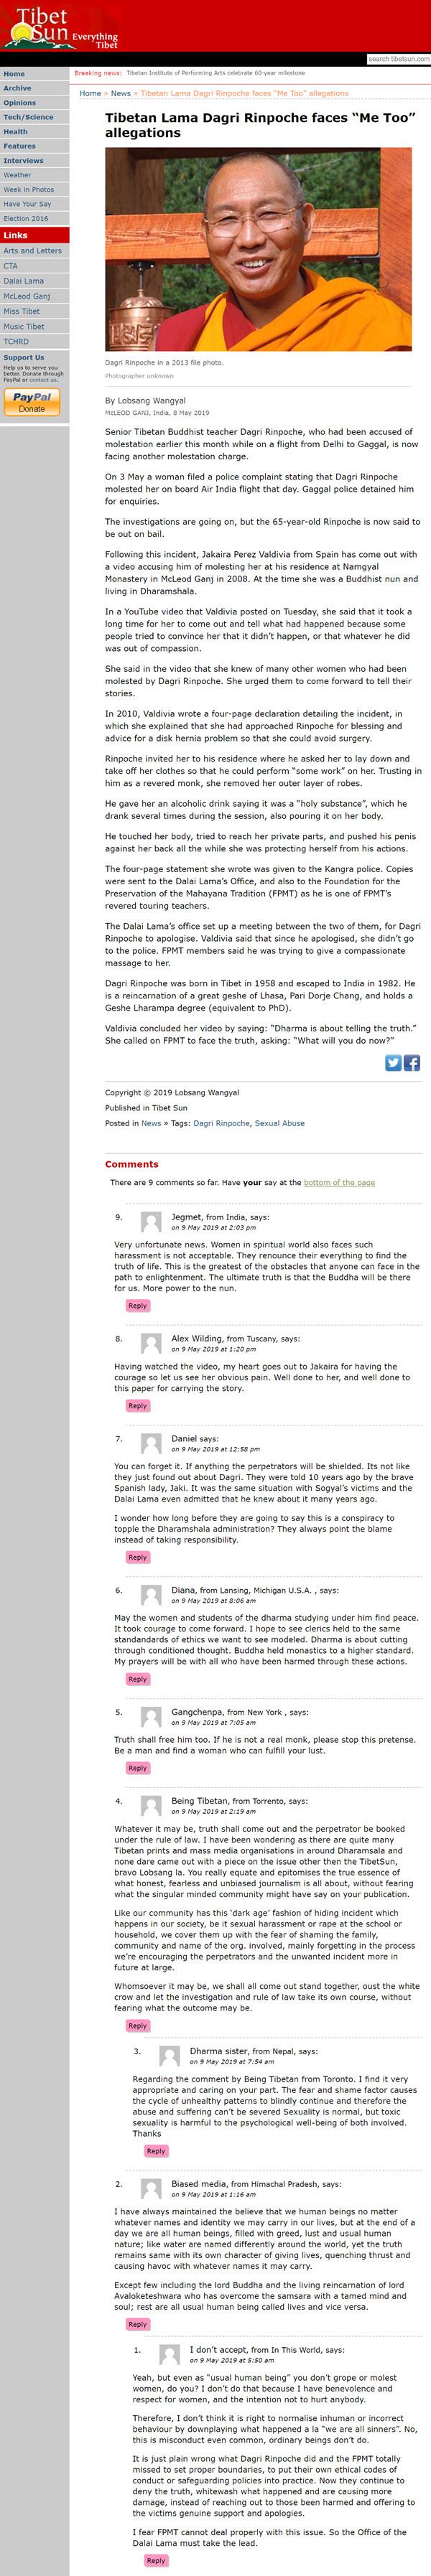 Screenshot of tibetsun.com's article